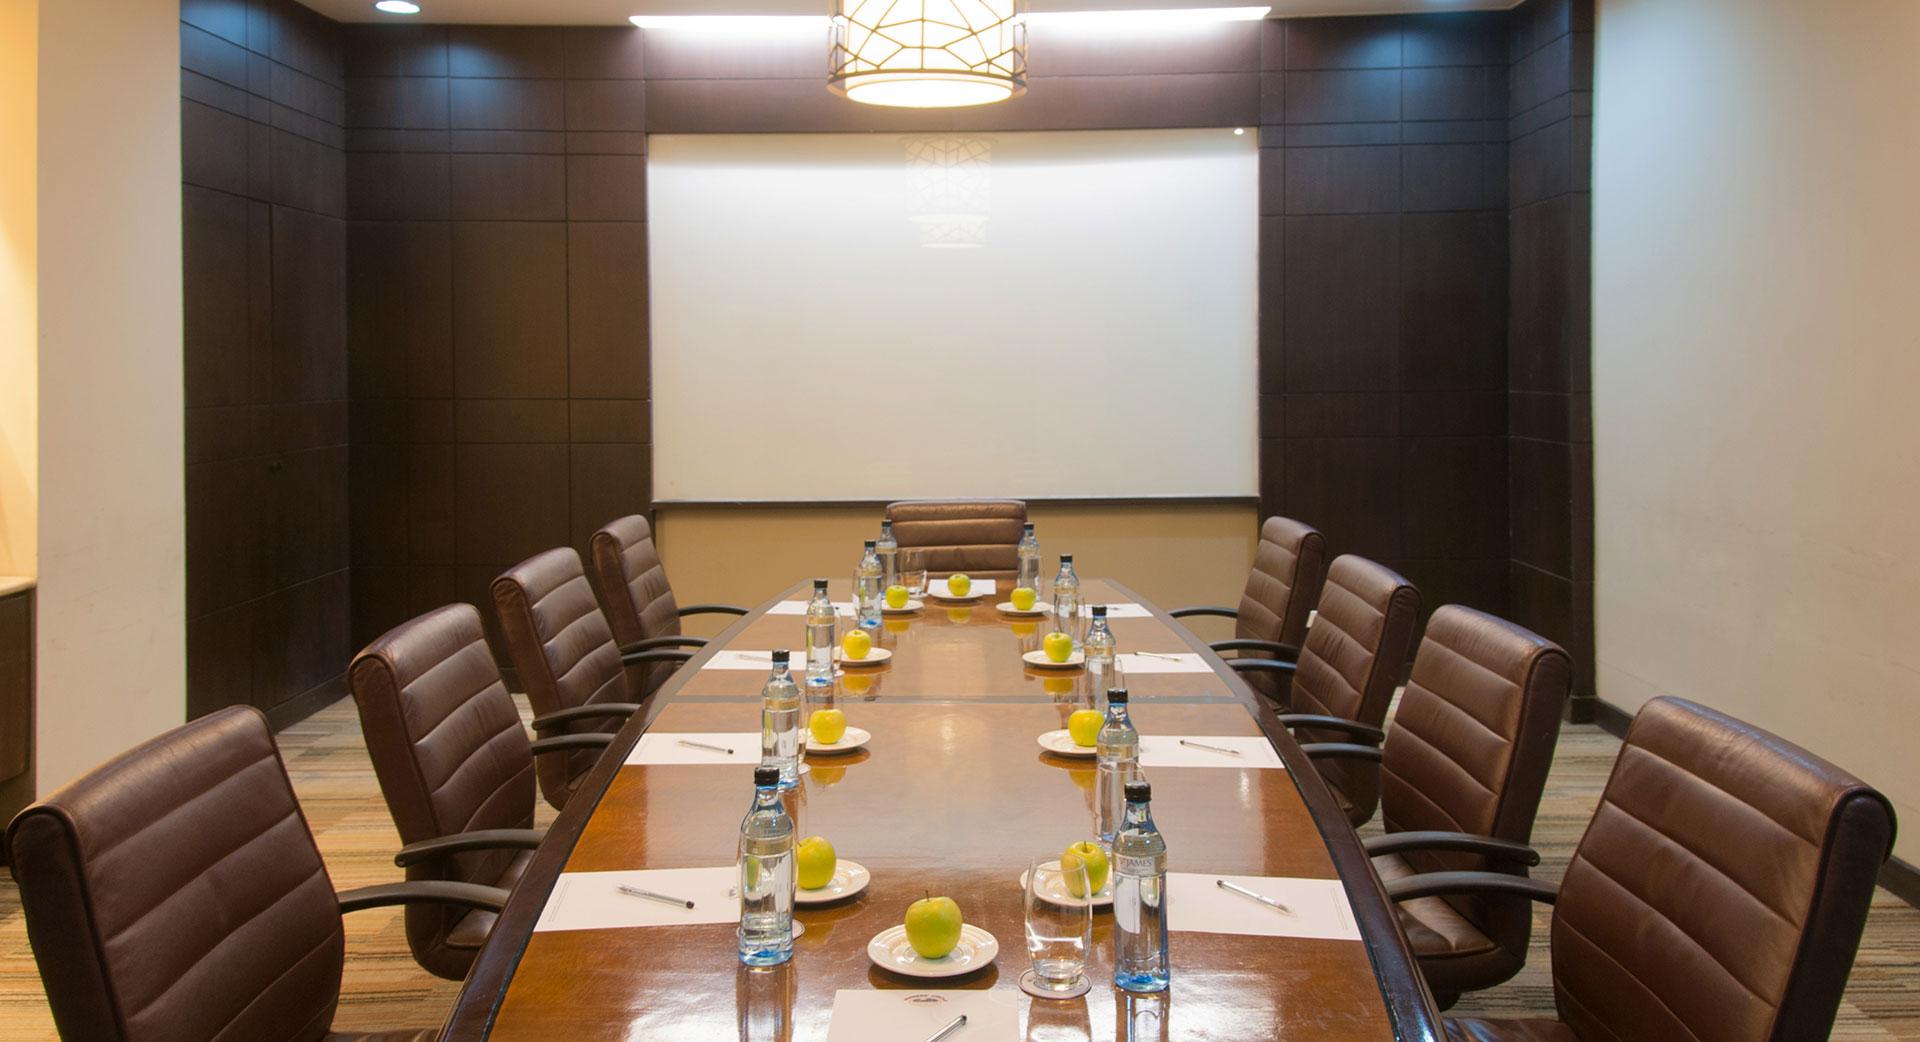 cscc_boardroom_1